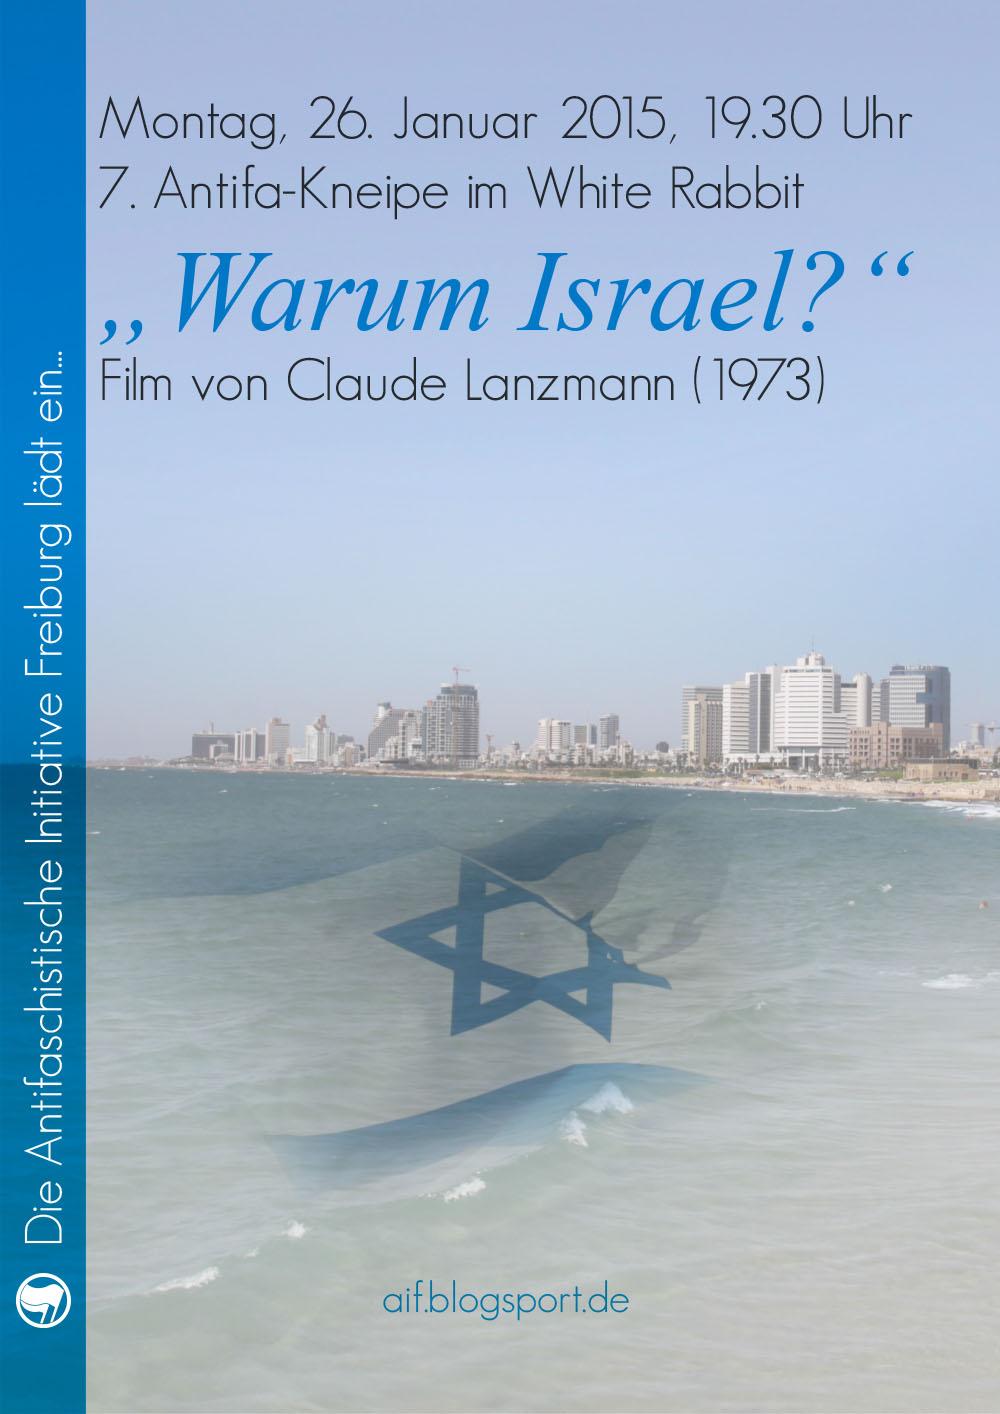 afakneipe7_warumisrael_web